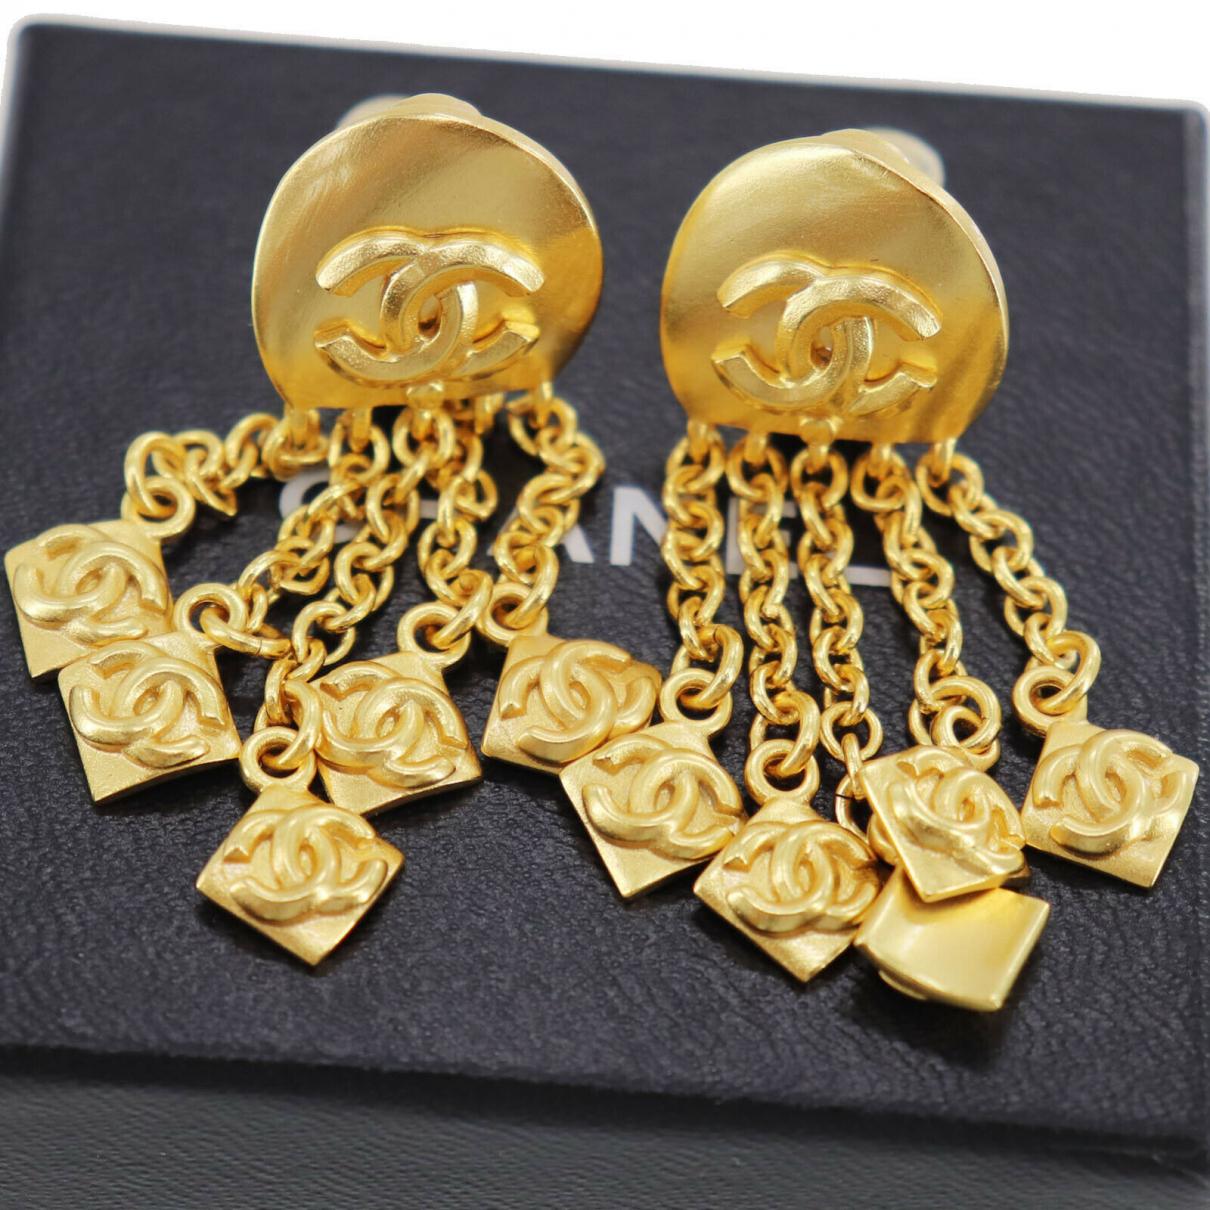 Chanel N Gold plated Earrings for Women N